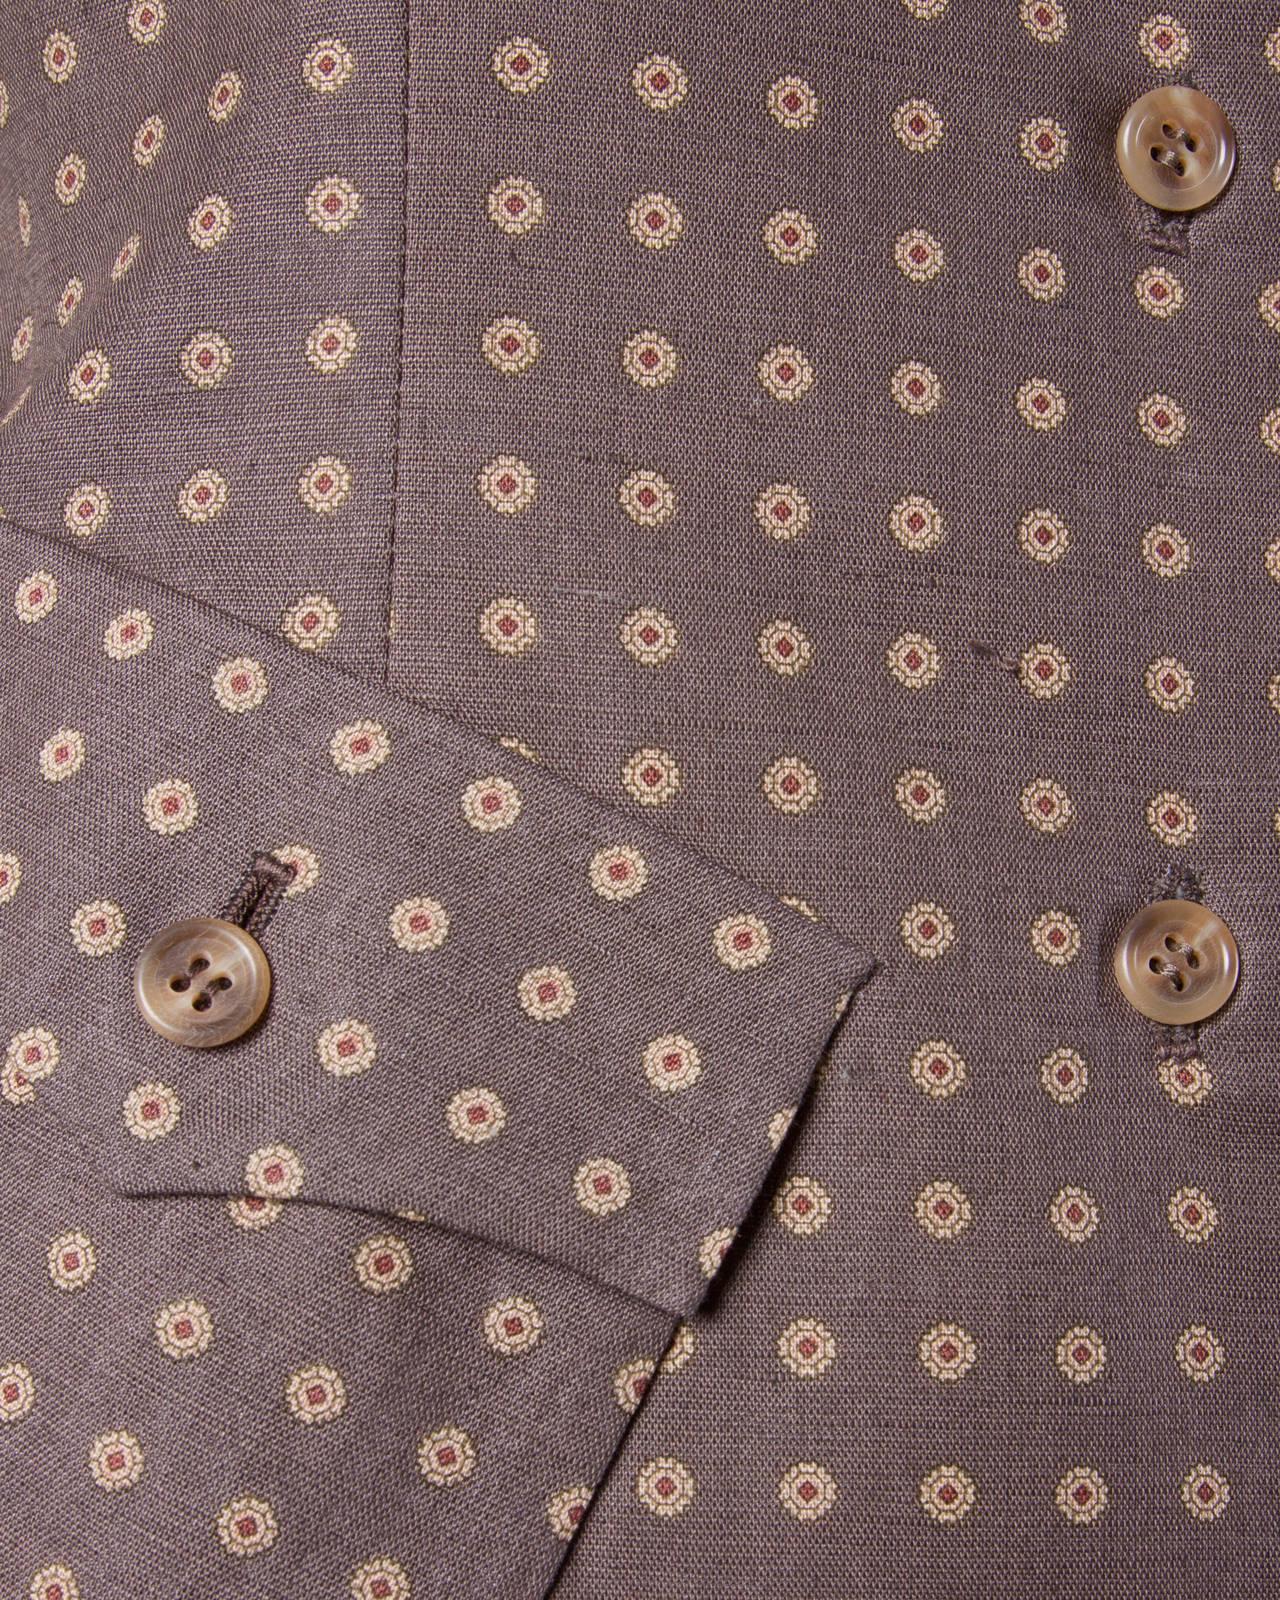 Bill Blass Unworn Deadstock Vintage Wool Jacket + Skirt Suit In New Condition For Sale In Sparks, NV